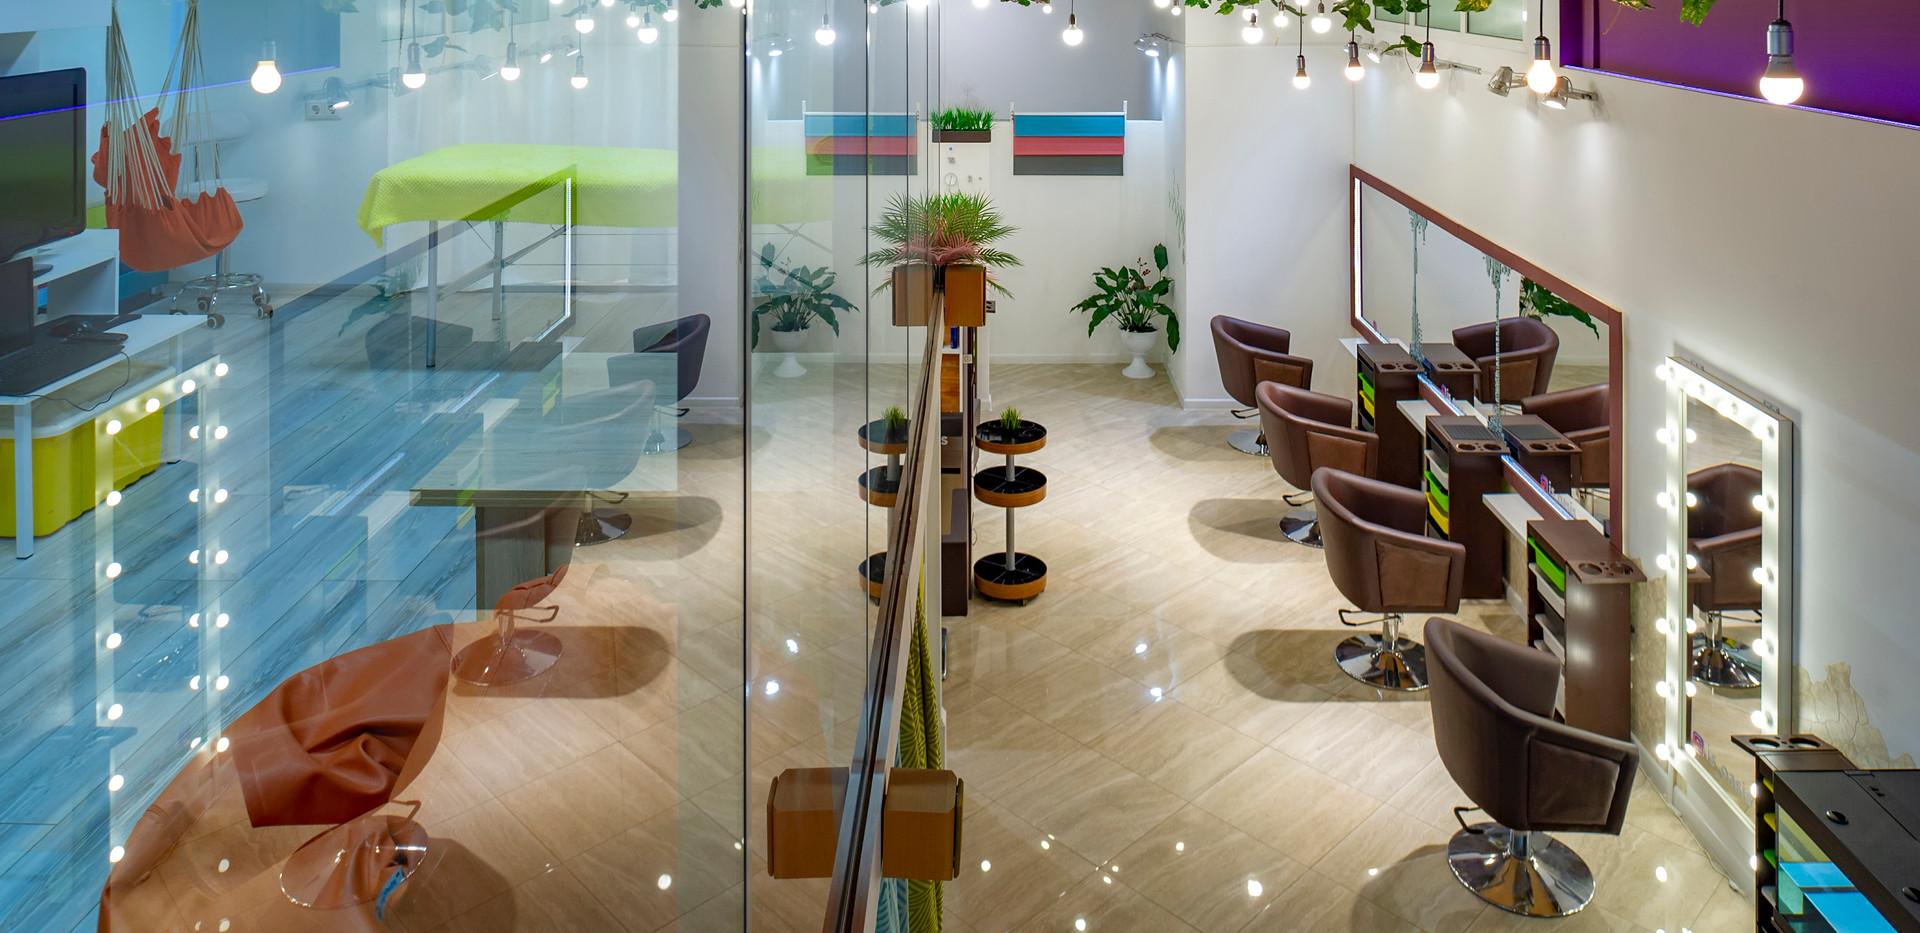 Salon krasoti na timiryazevskoi